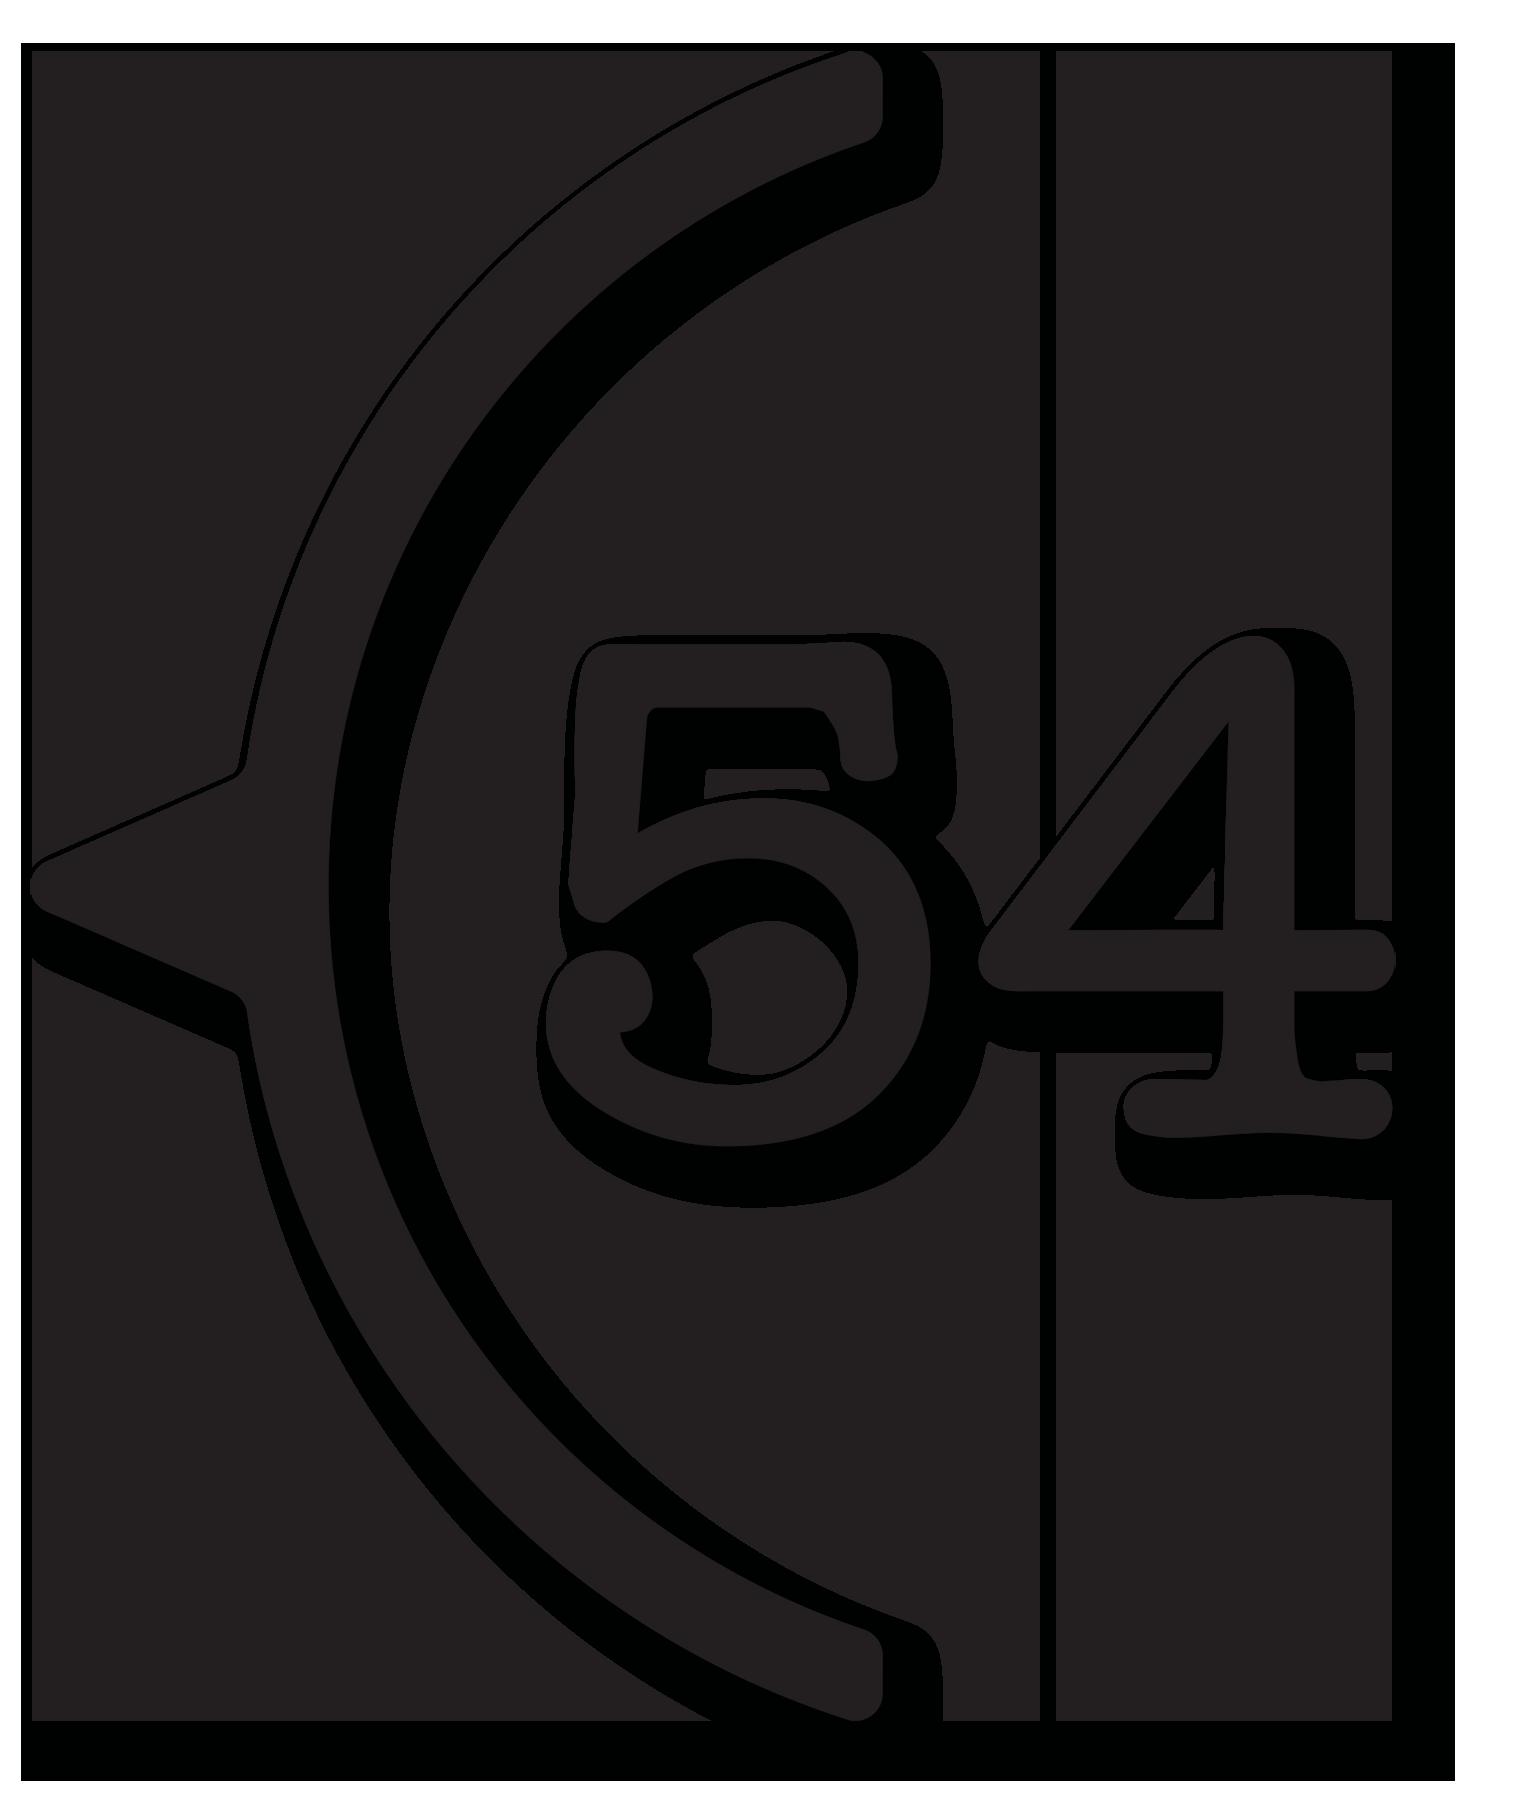 54WestIcon_shadow.png